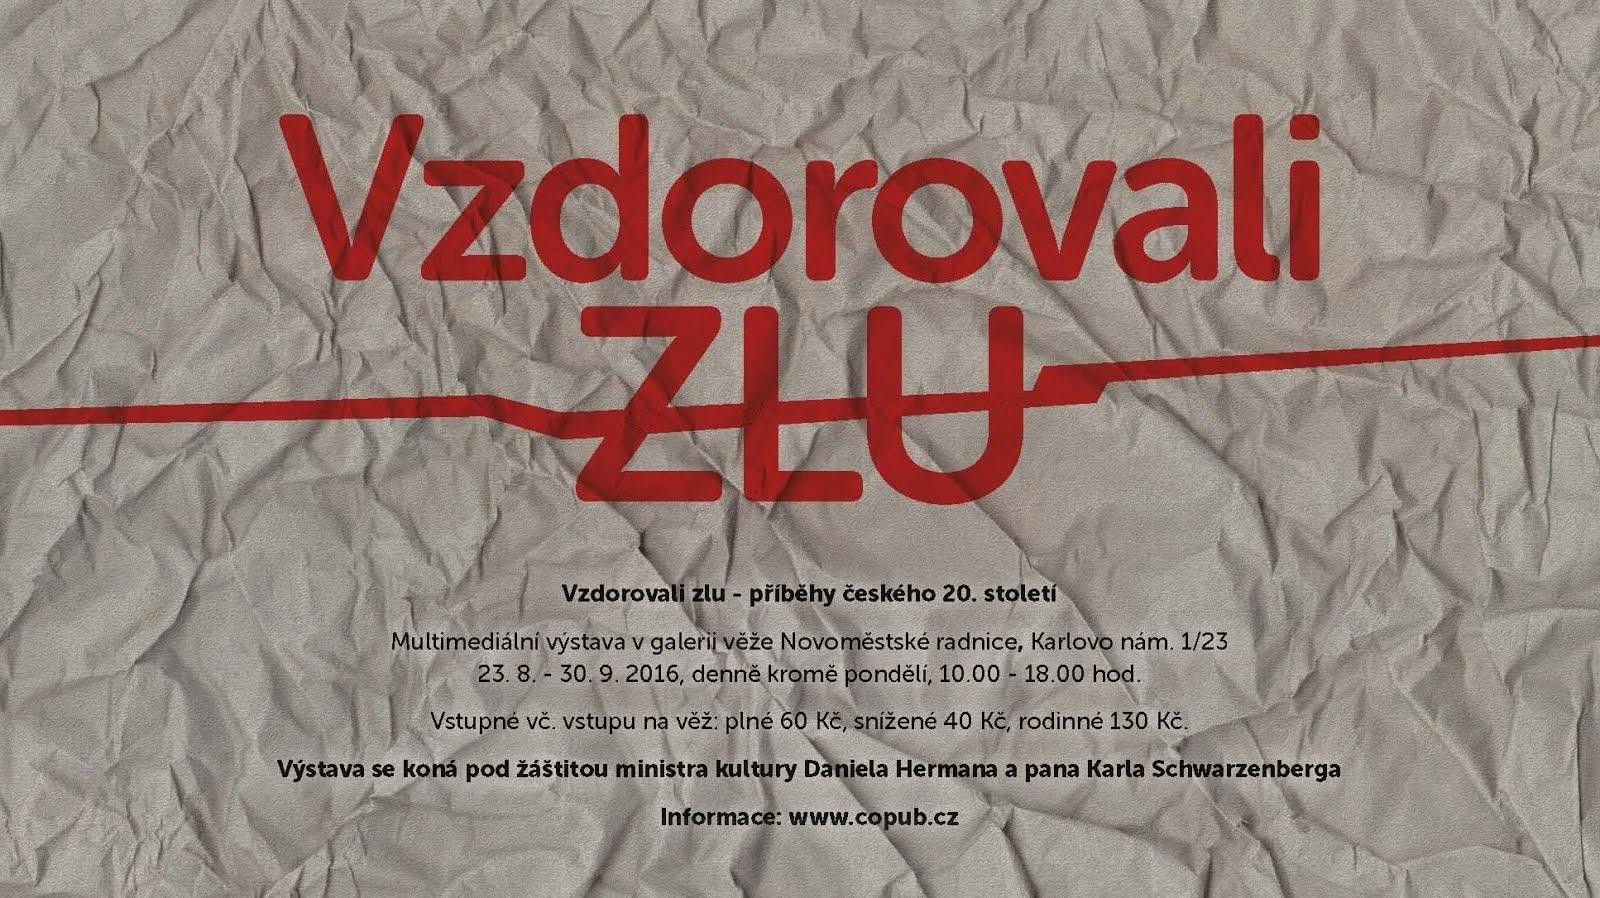 Výstava-VzdorovaliZLU-Zahradníček-Toufar